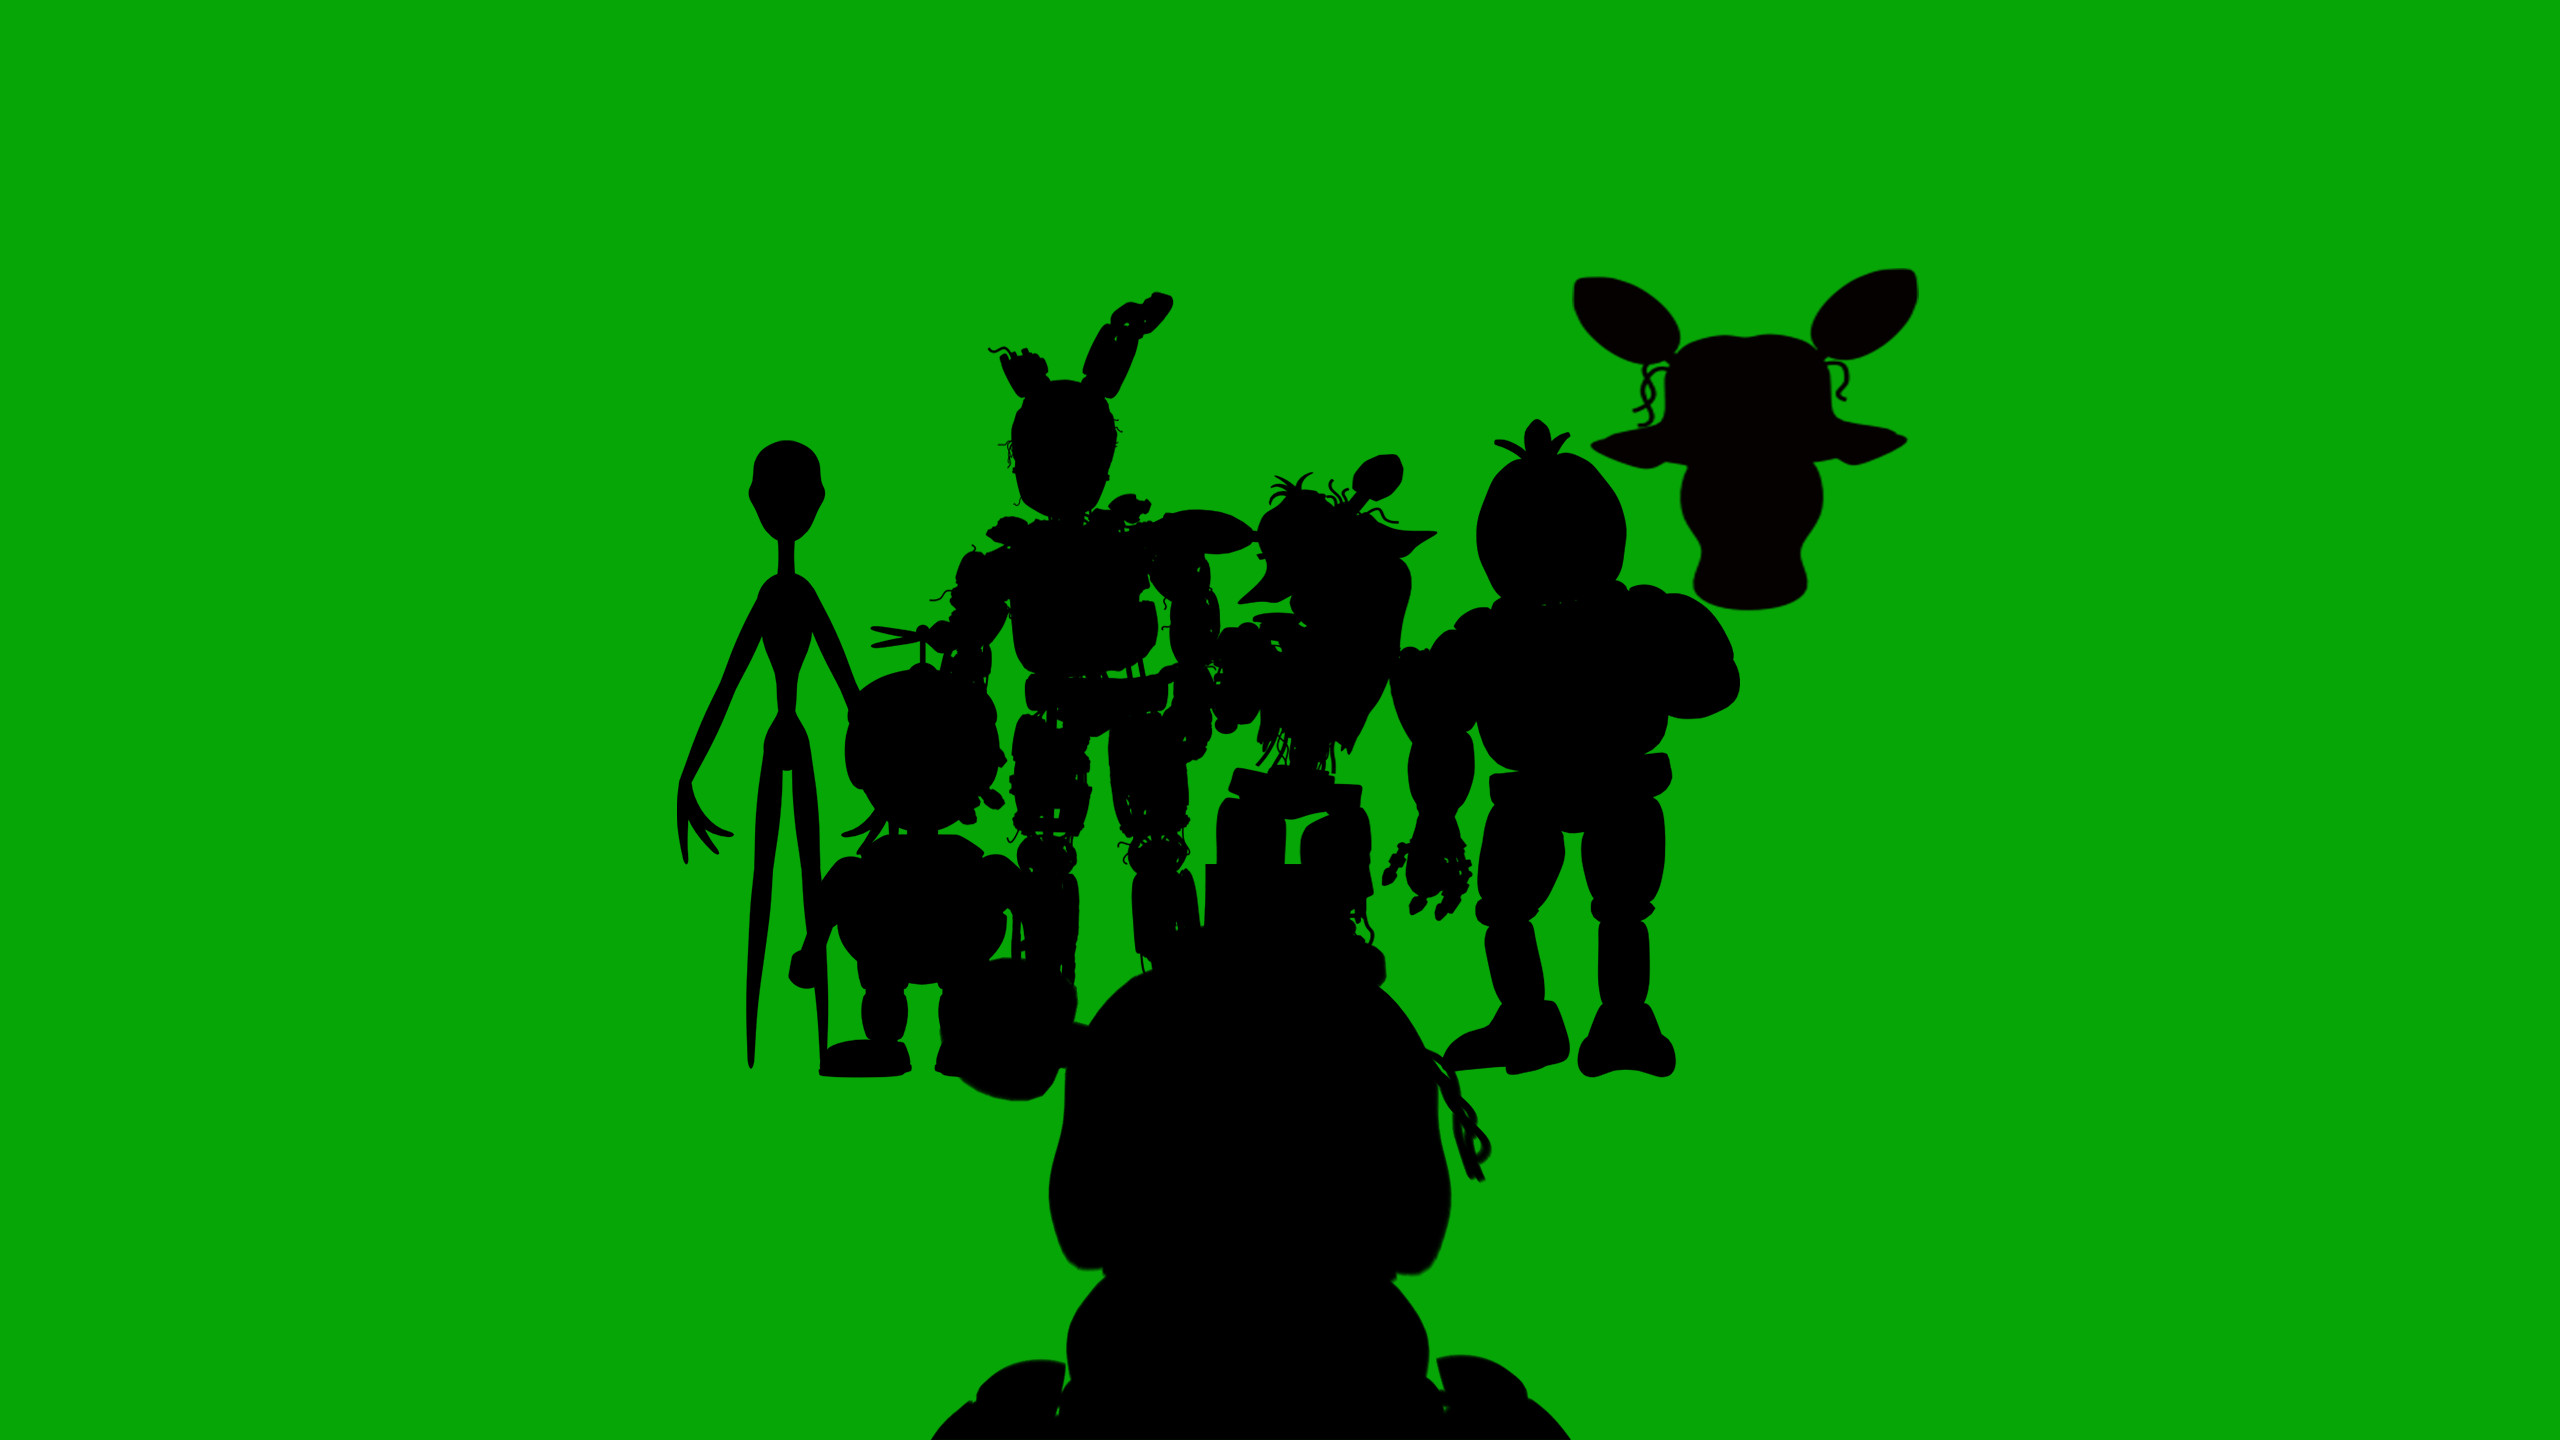 … Five nights at freddys 3 wallpaper (Green) by BlenderBLAST448